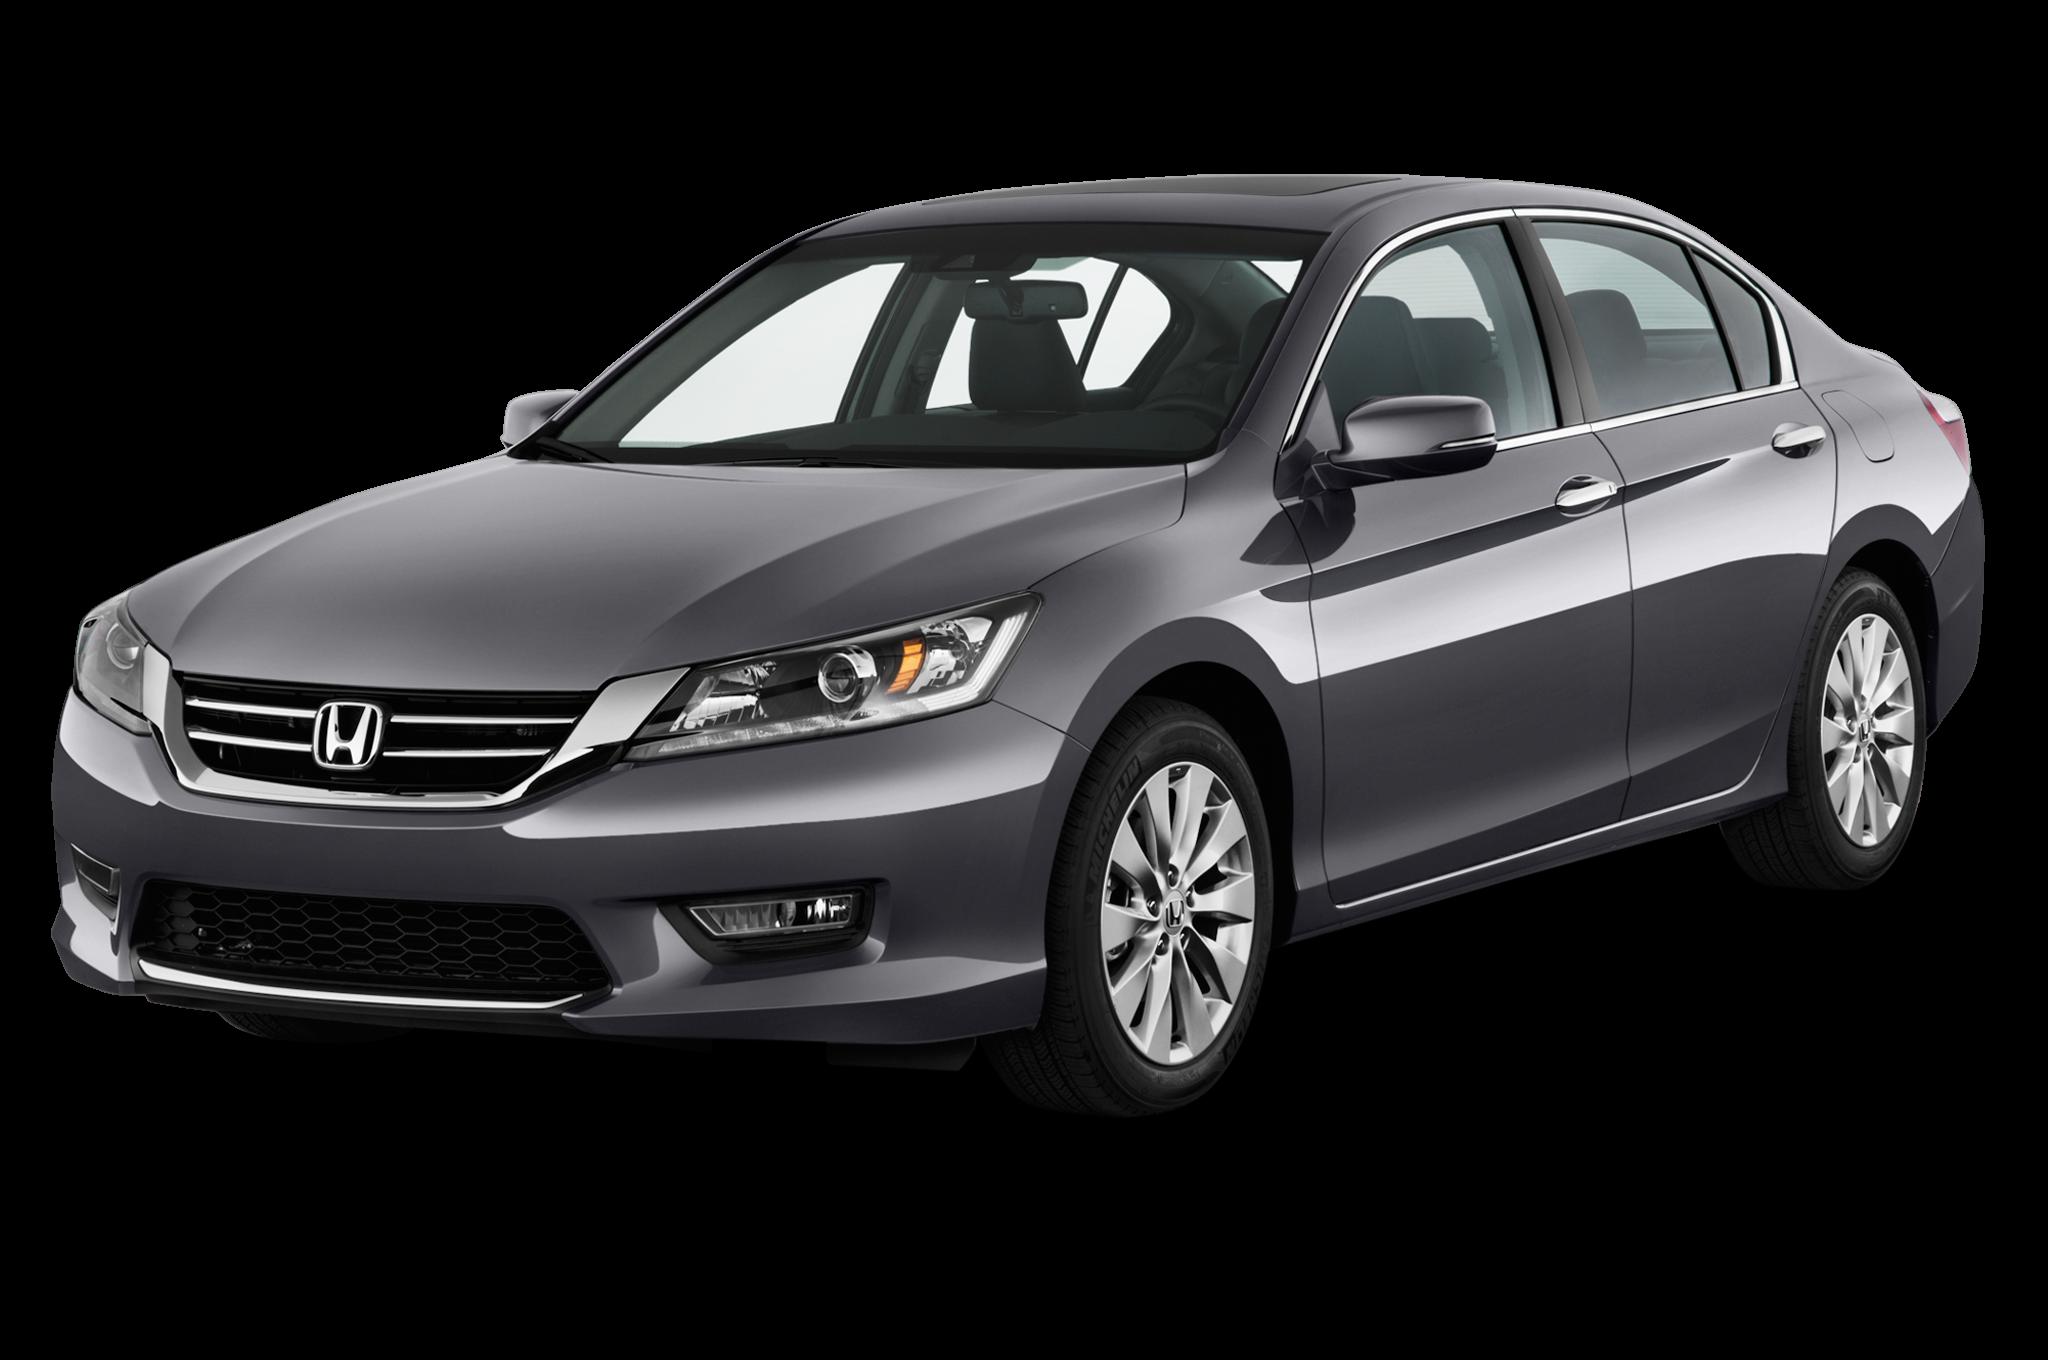 Honda ACCORD LX S 2013 International Price & Overview